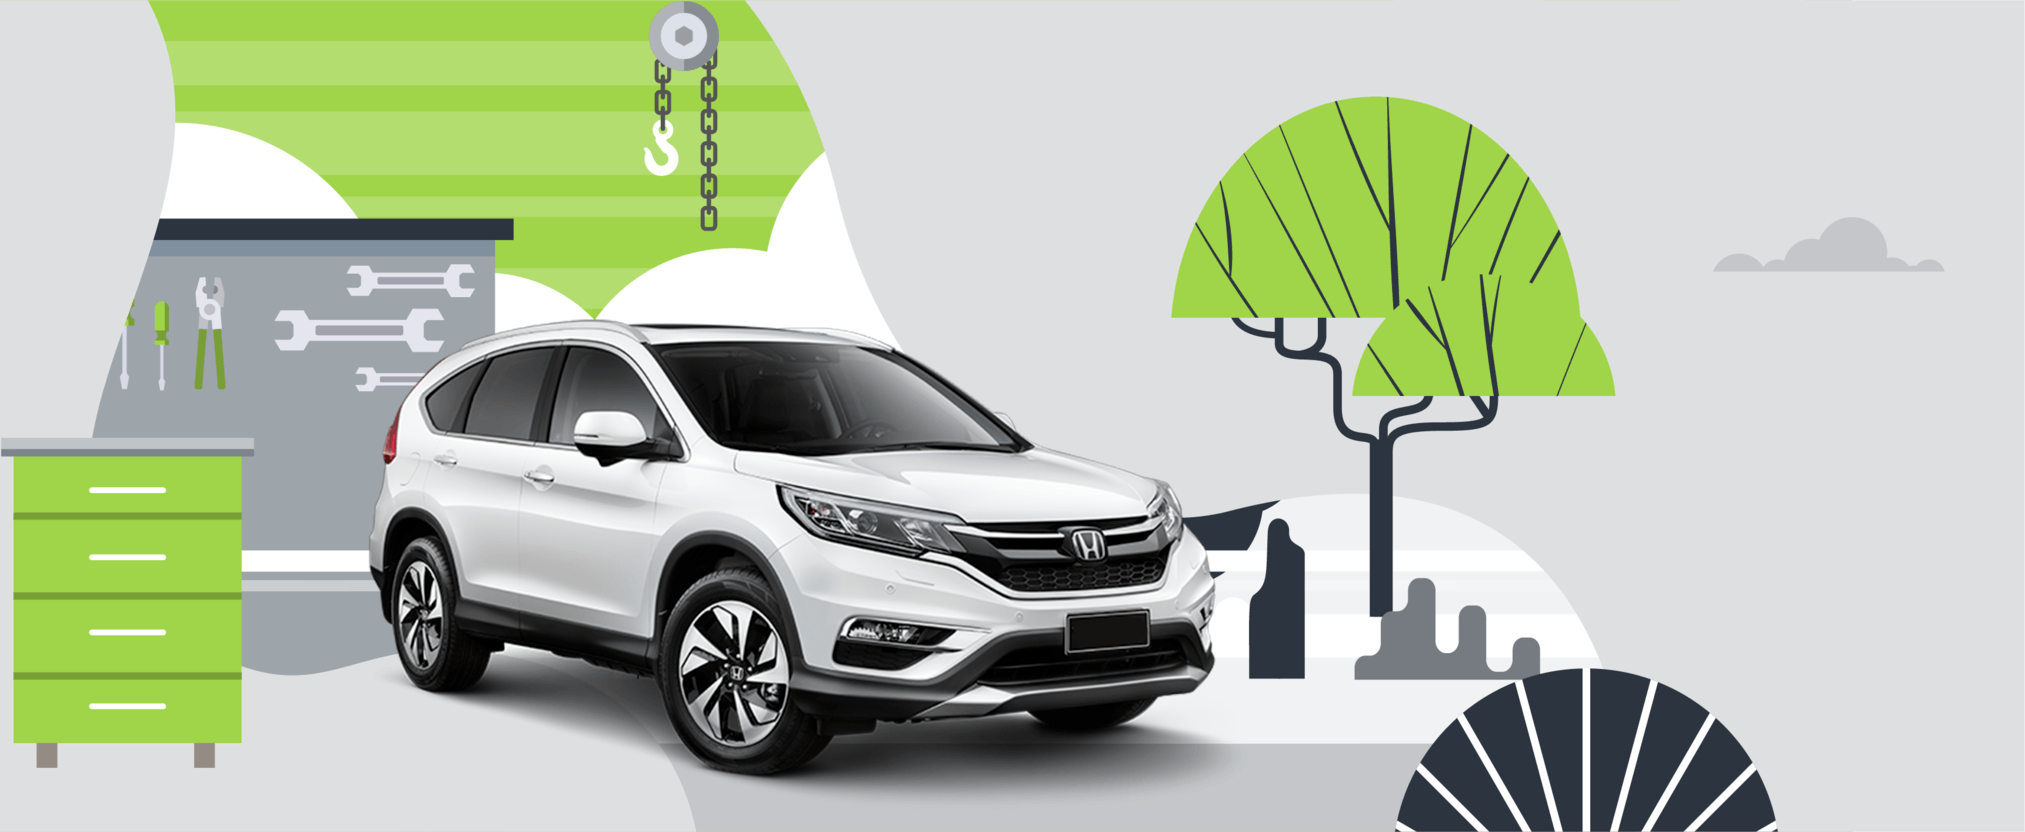 Honda CRV protected from expensive repairs